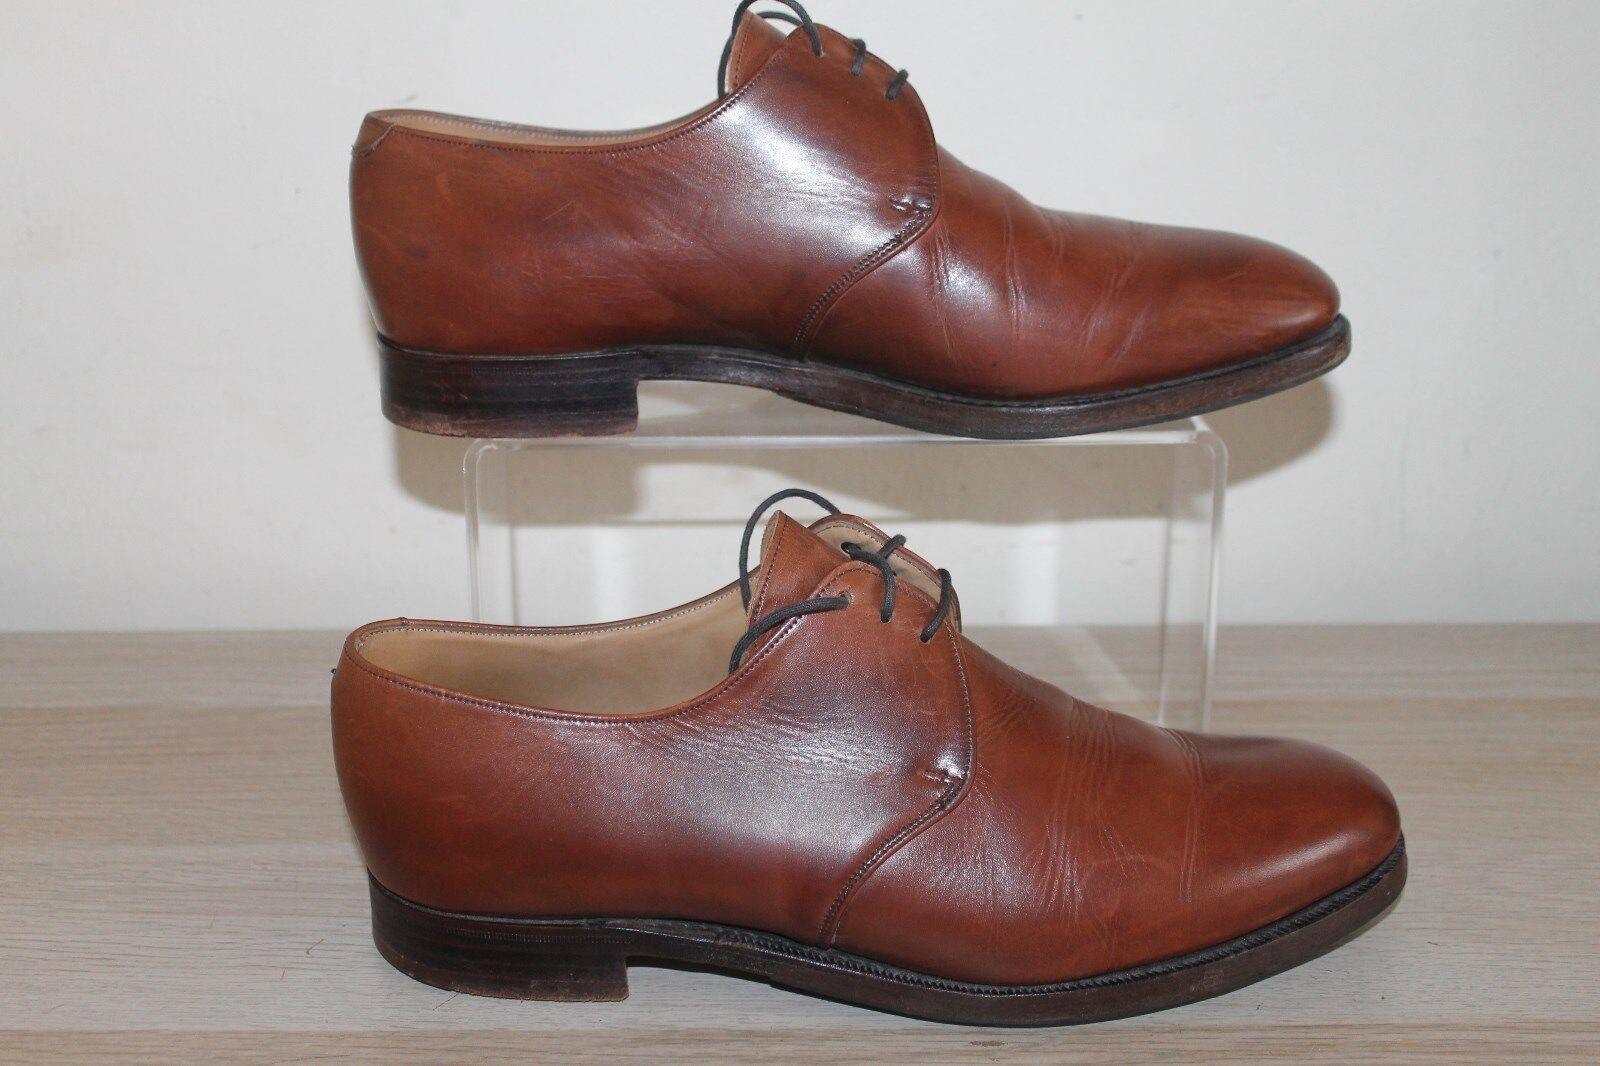 Shipton and Braun Heneage   Herren Braun and Leder Lace Up Schuhes Größe 8 - may18 772947